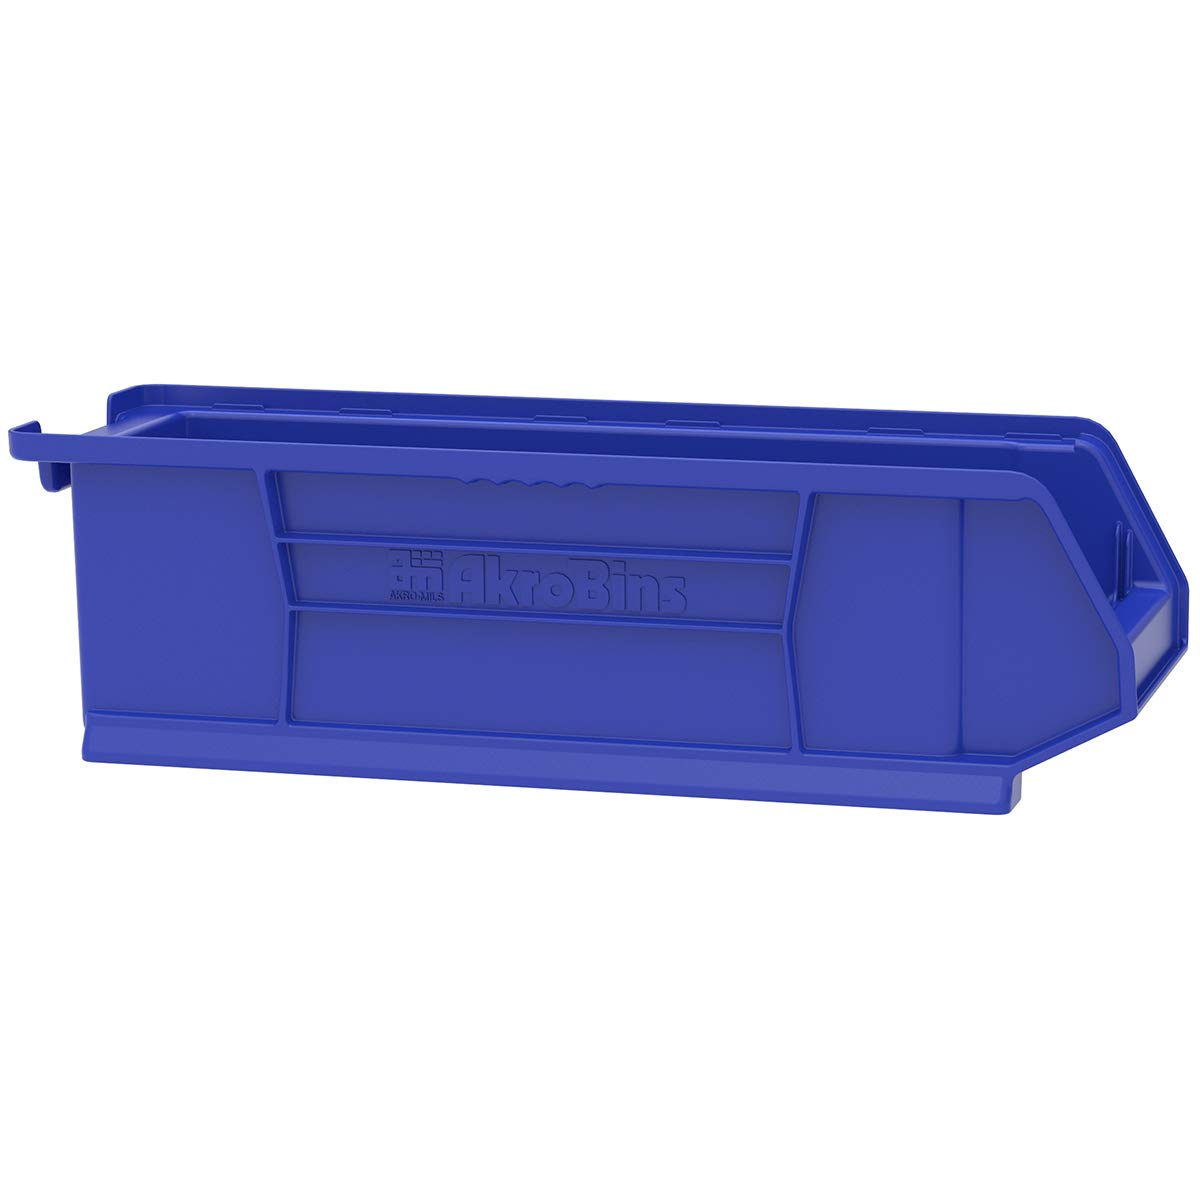 Akro-Mils 30284 Super Size Plastic Stacking Storage Akro Bin, 24-Inch Diameter by 8-Inch Width by 7-Inch Height, Blue, Case of 4 by Akro-Mils (Image #6)